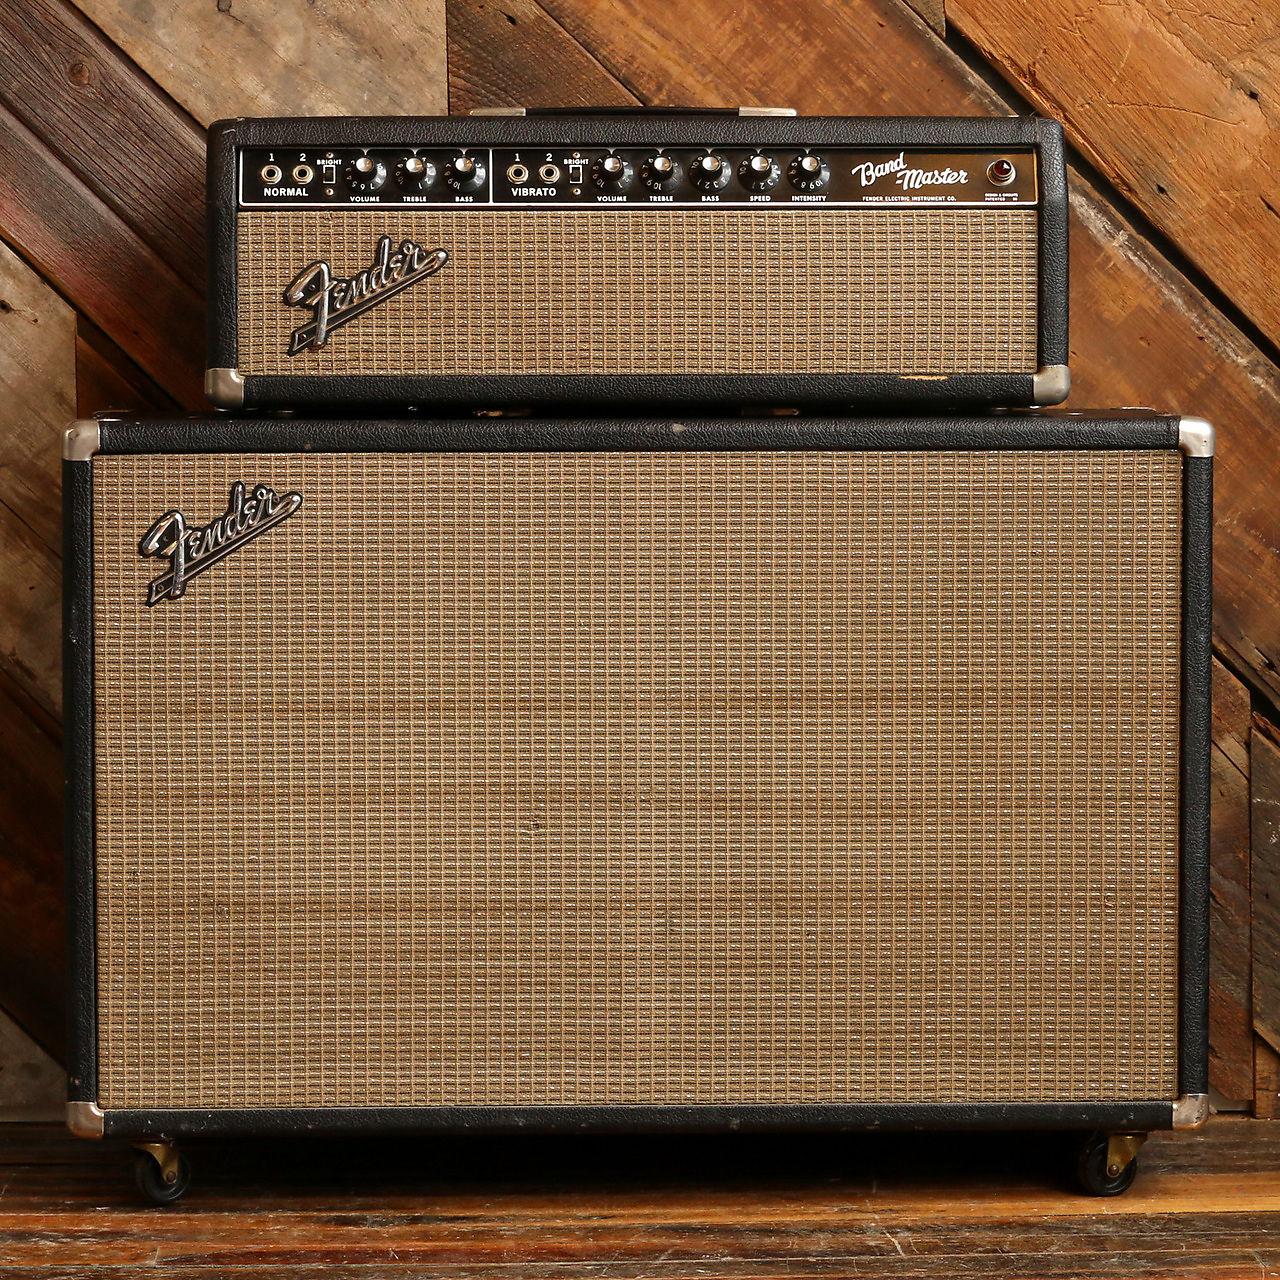 1965 Fender Bandmaster Piggyback Amp & Cab